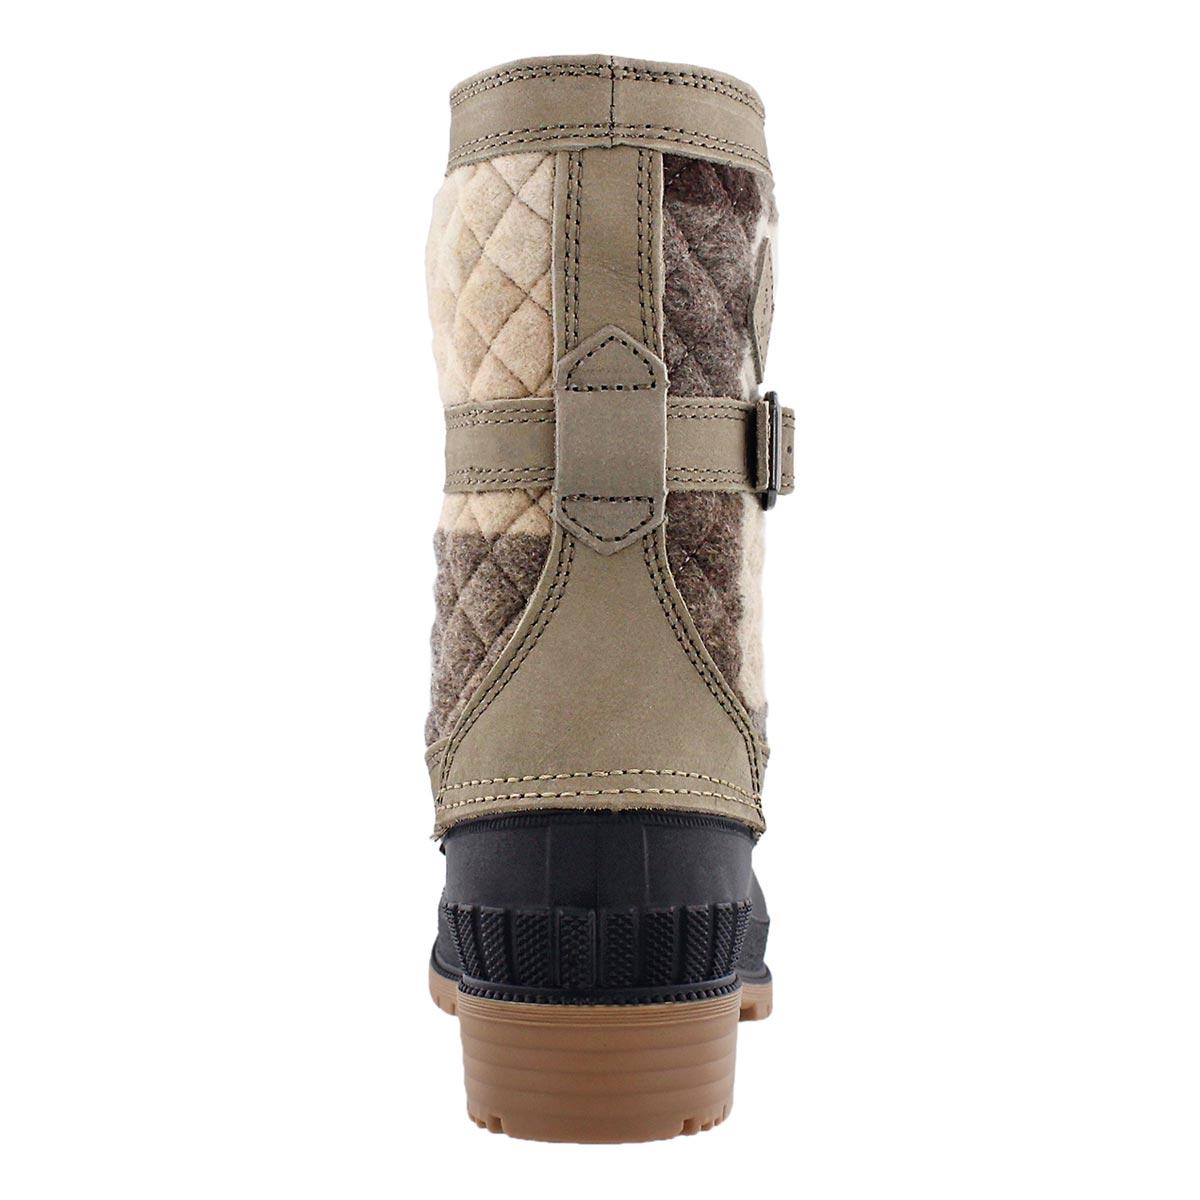 Lds Sienna taupe waterproof winter boot